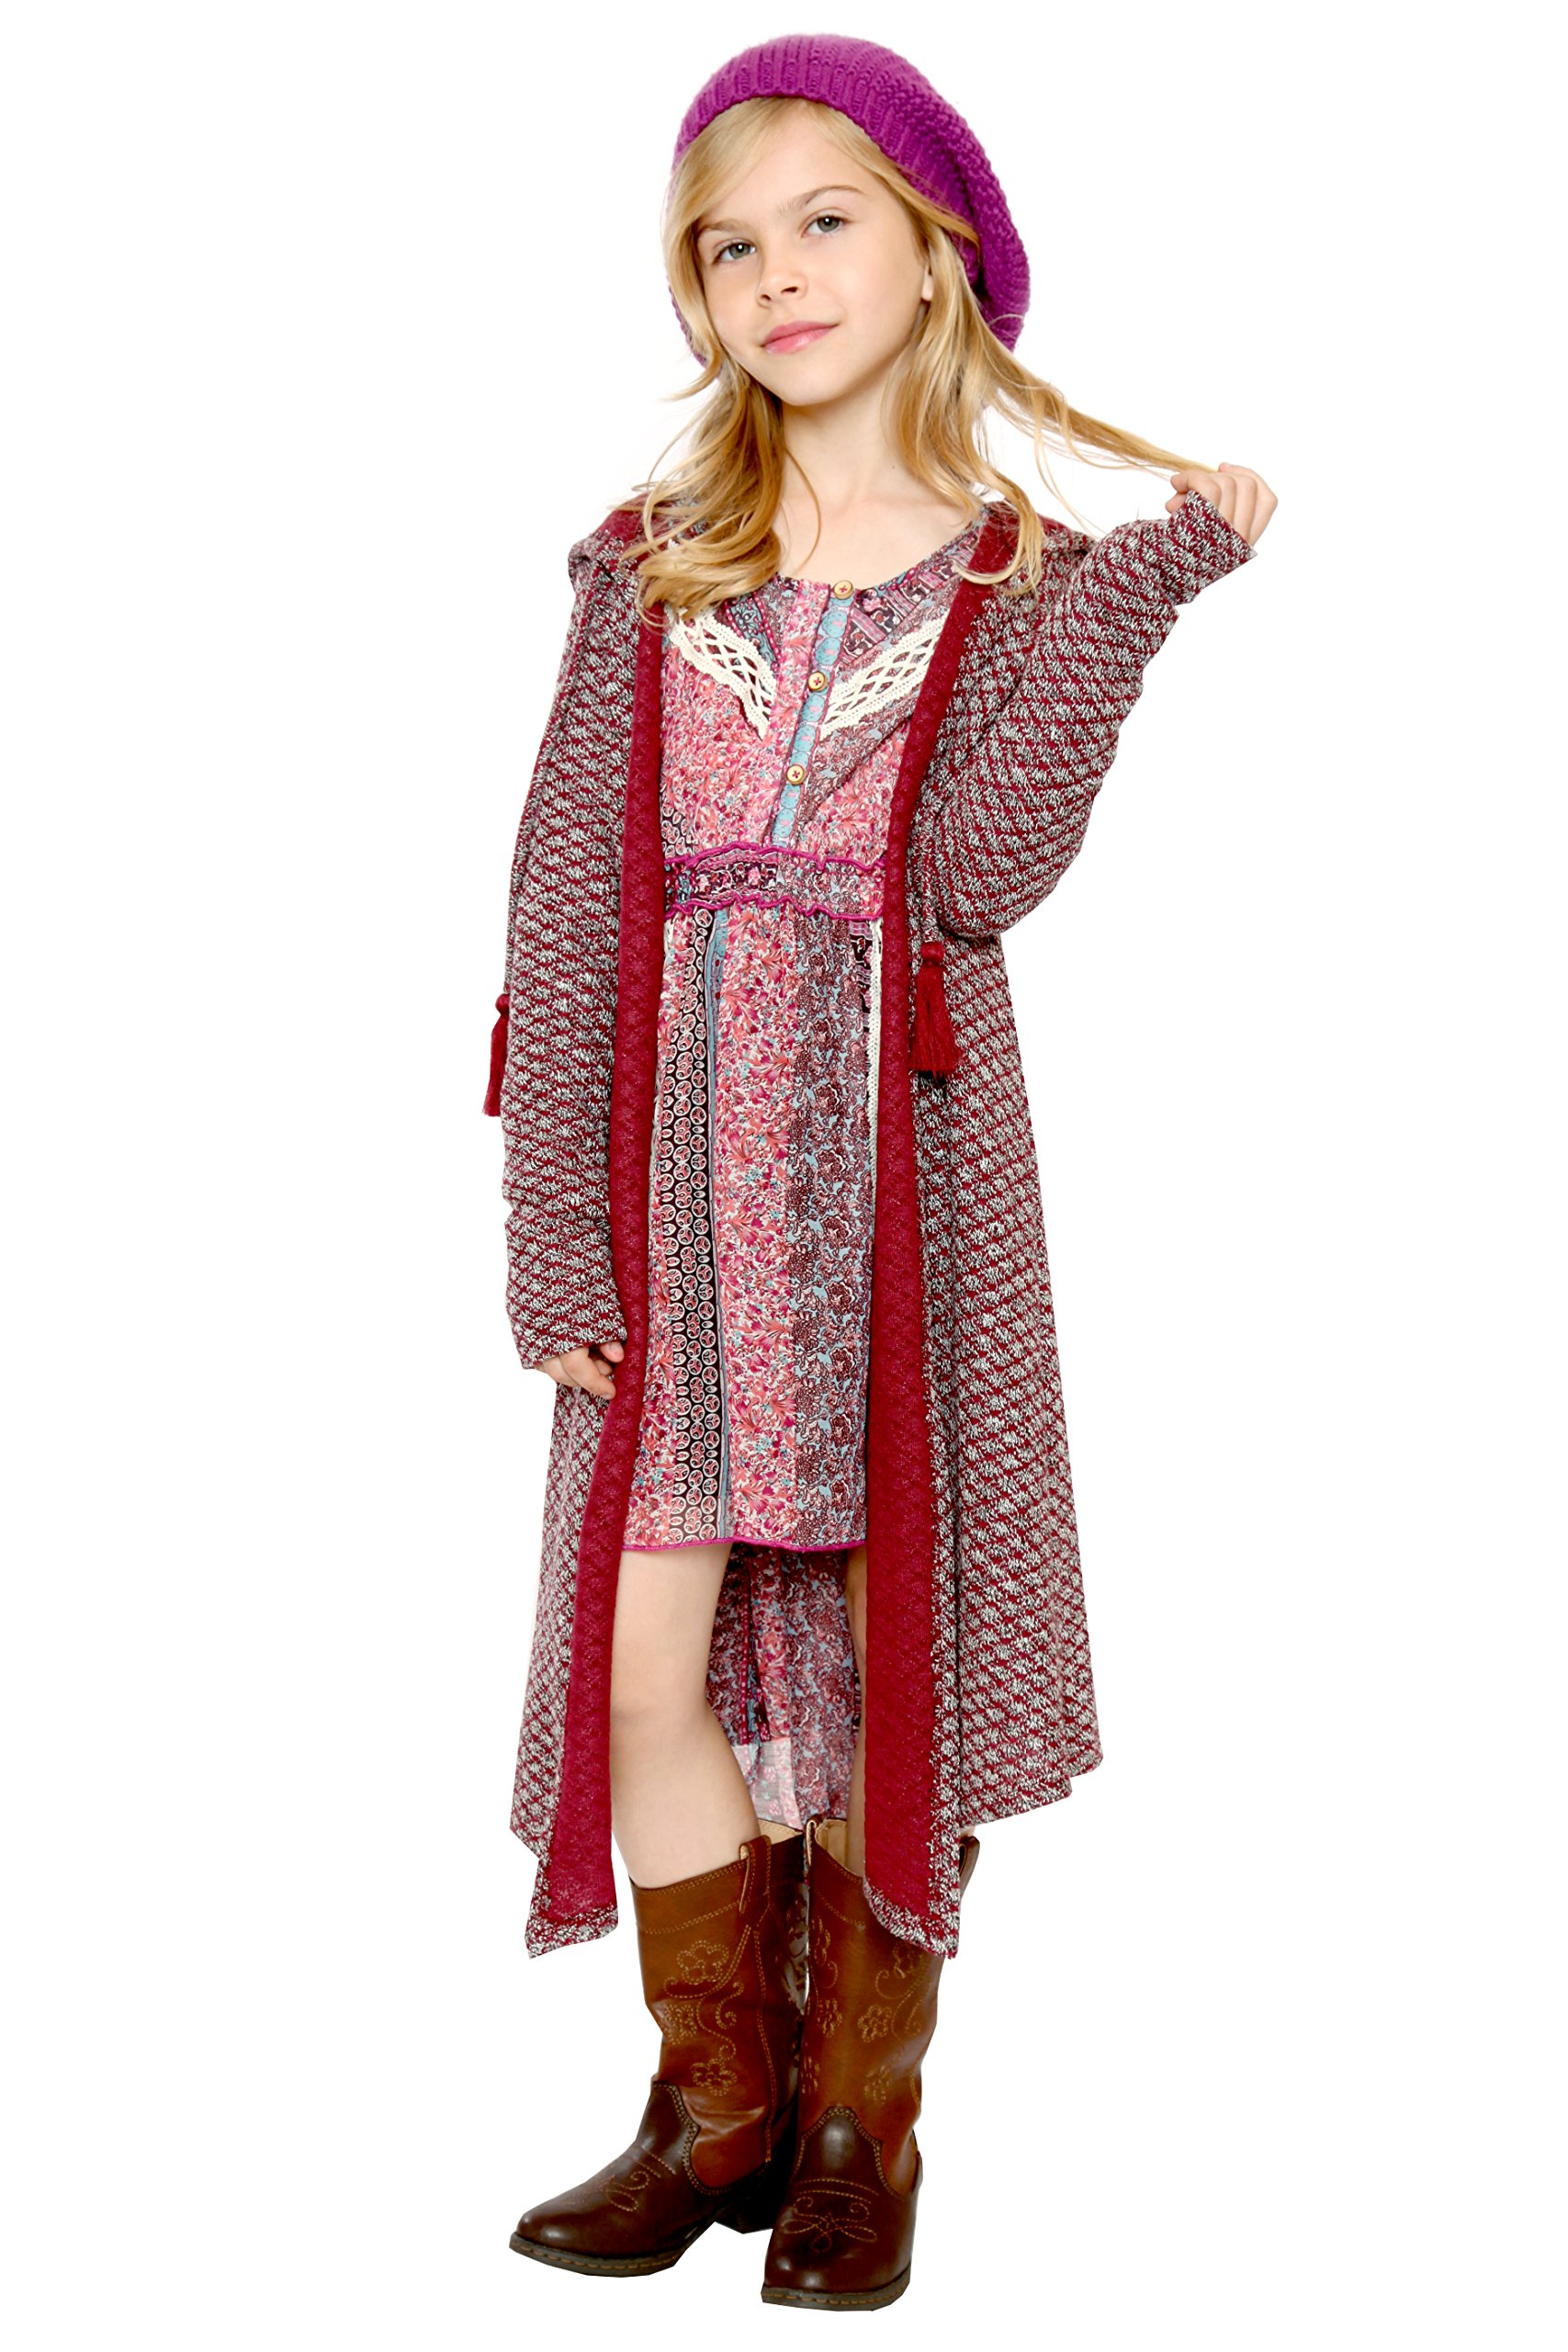 Truly Me, Big Girls Knit Long Sweater, 7-16 (16, Burgundy)